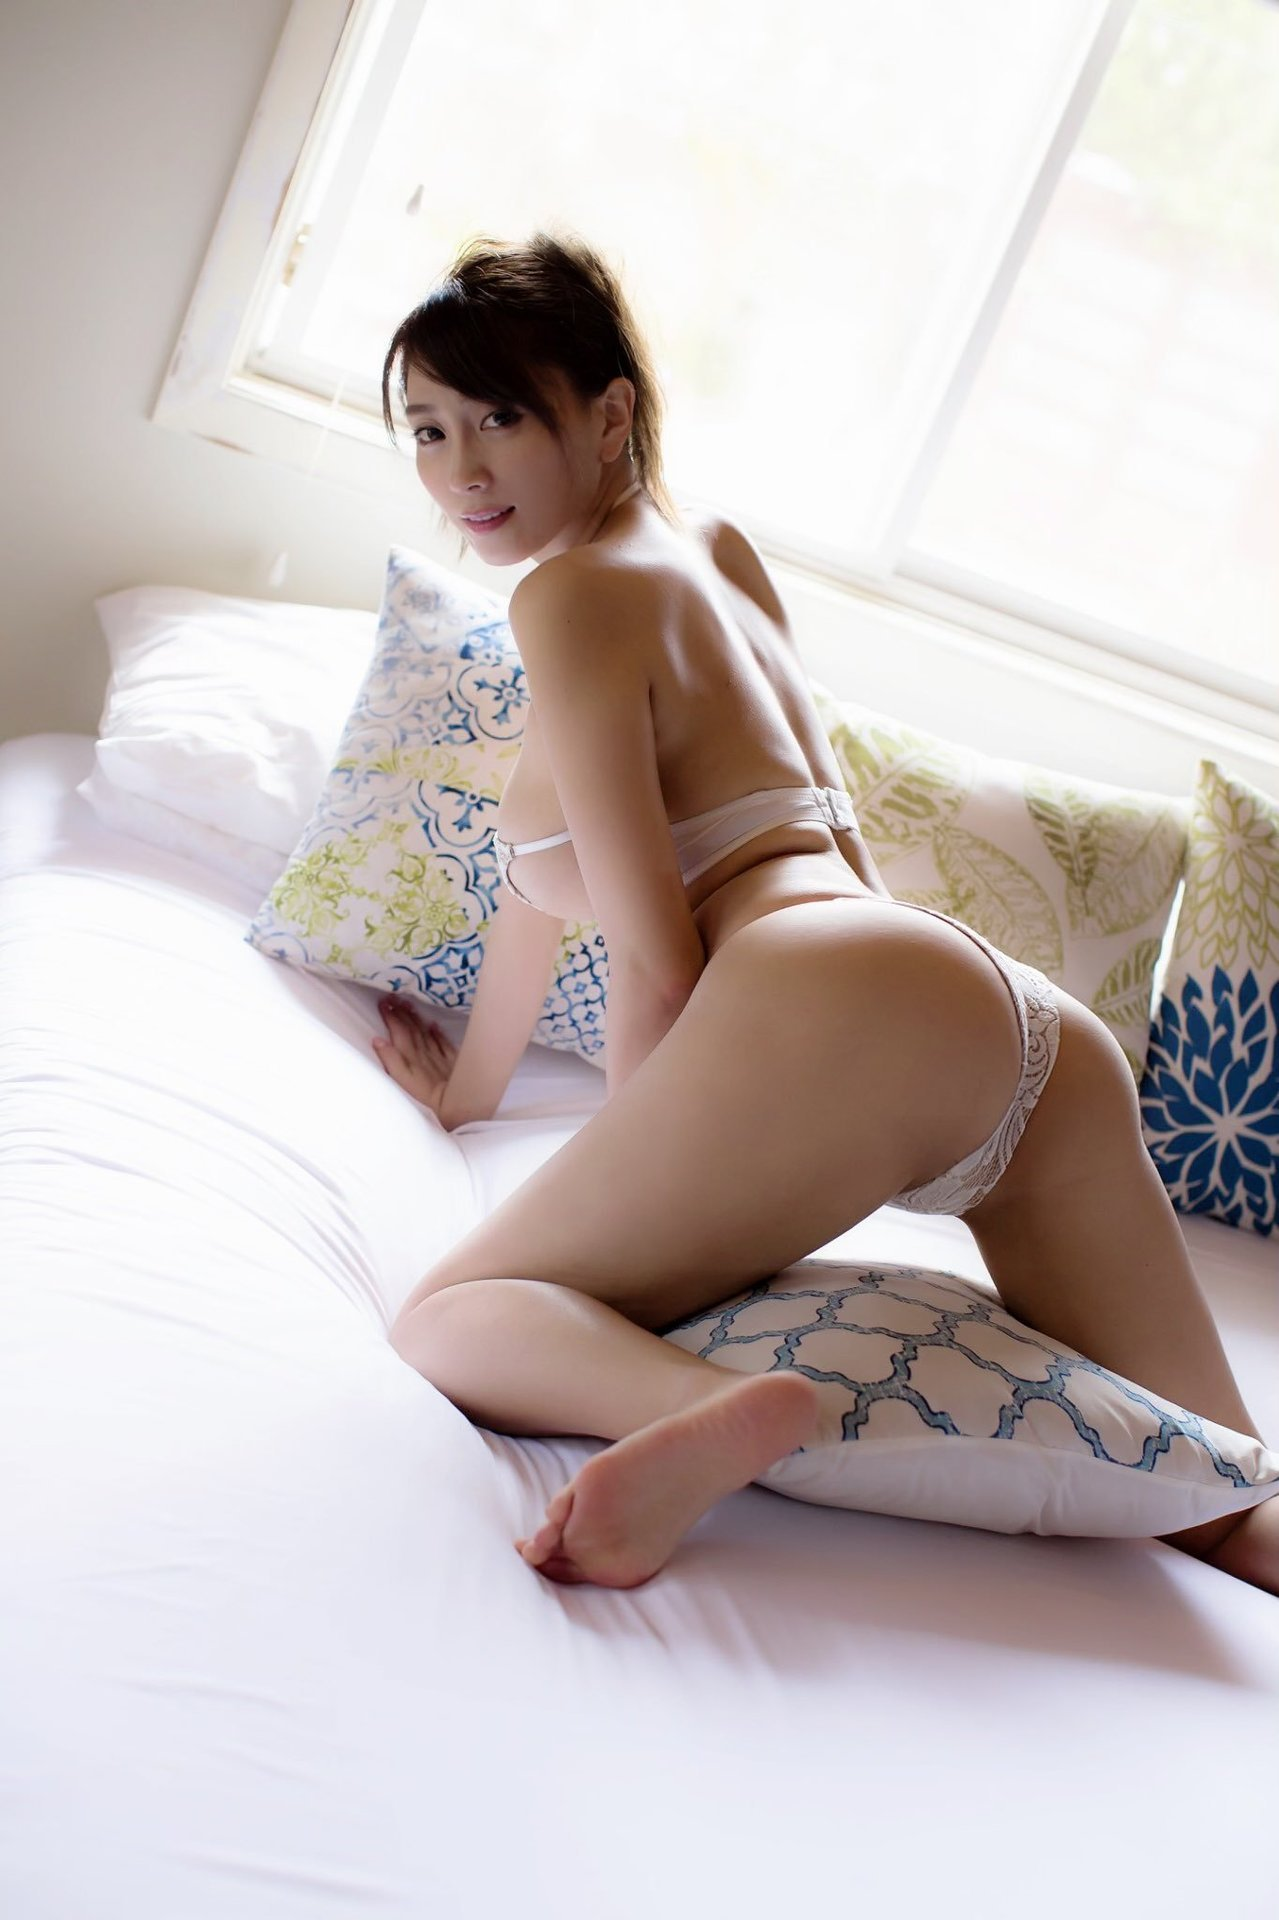 morisaki_tomomi255.jpg